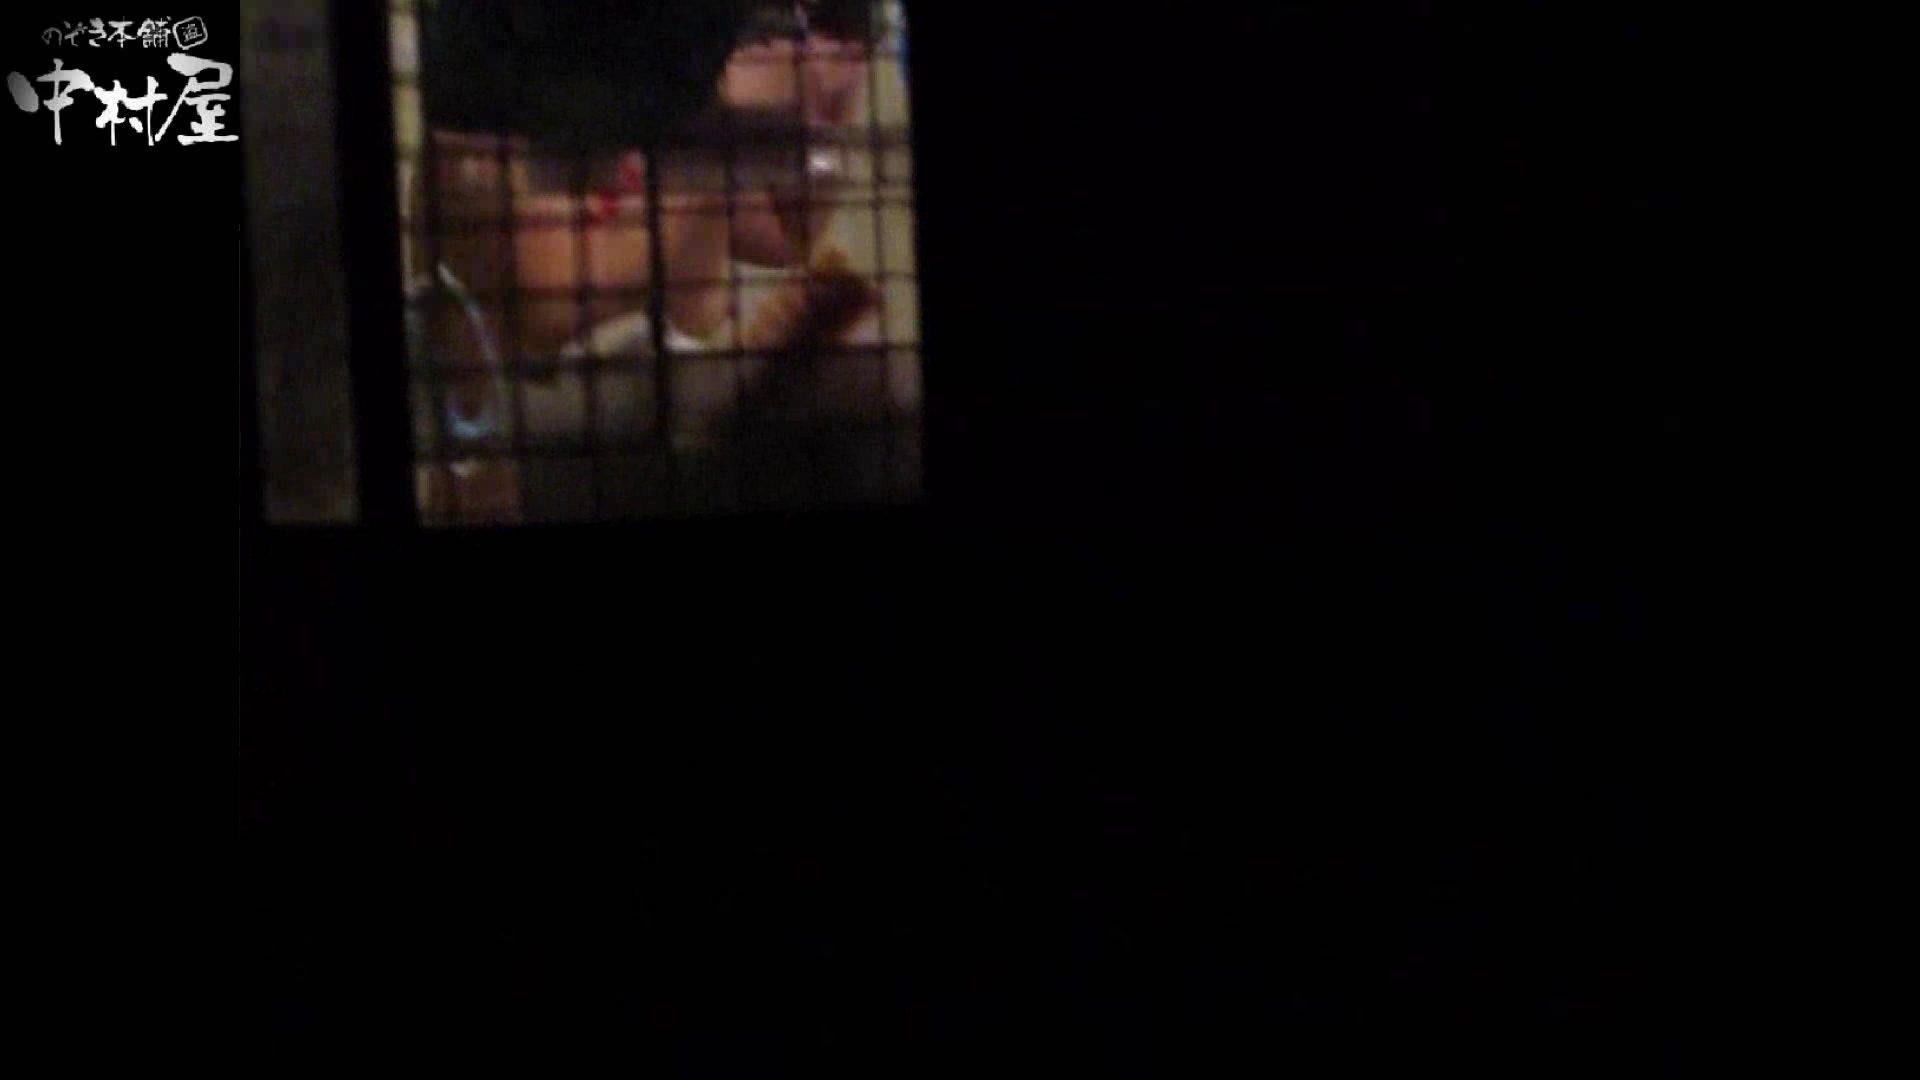 民家風呂専門盗撮師の超危険映像 vol.023 OLのエロ生活 性交動画流出 95連発 86